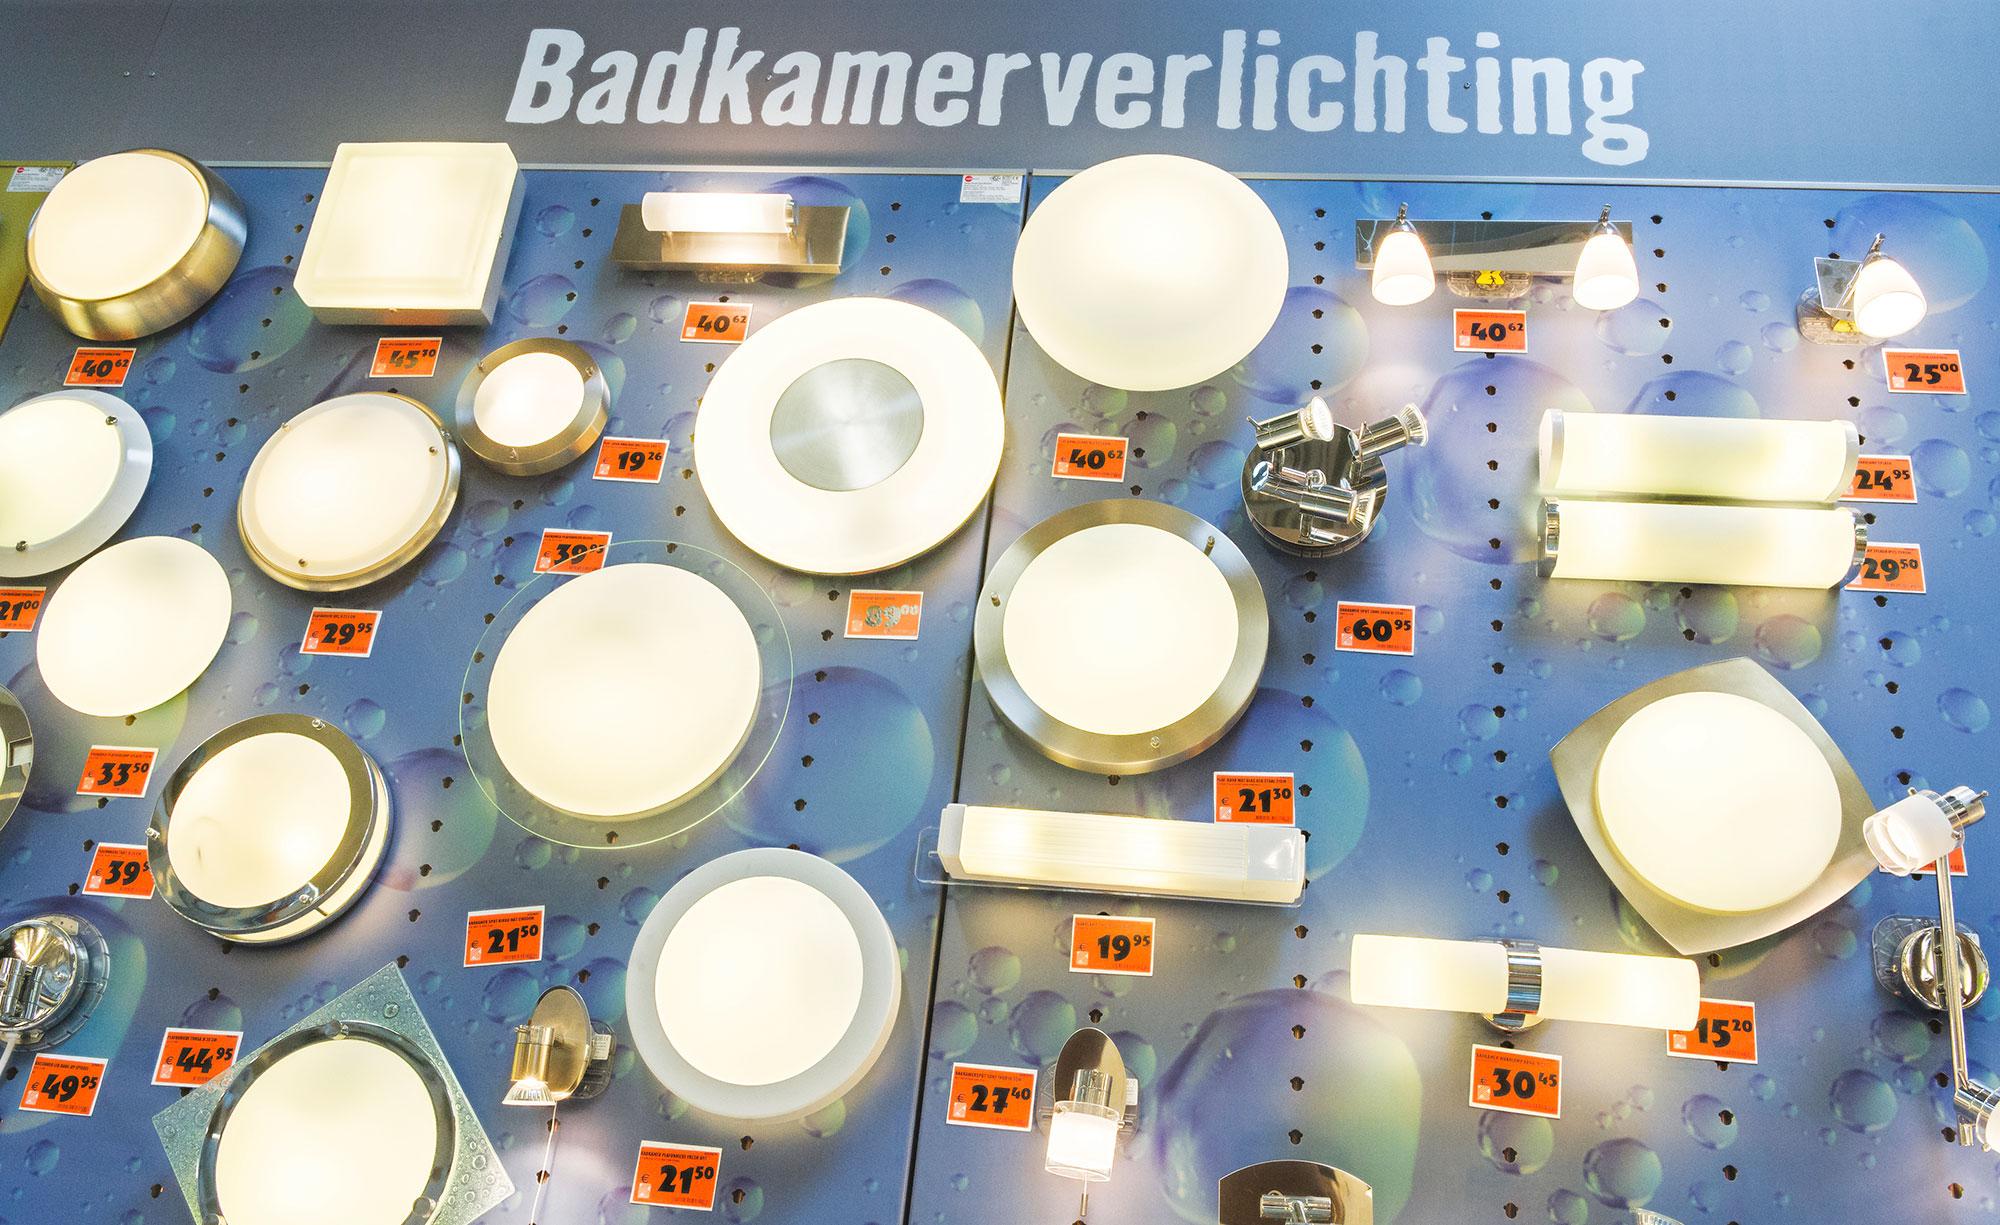 https://pers.hornbach.nl/wp-content/uploads/2014/11/verlichtingsafdeling-hornbach-alblasserdam-05.jpg